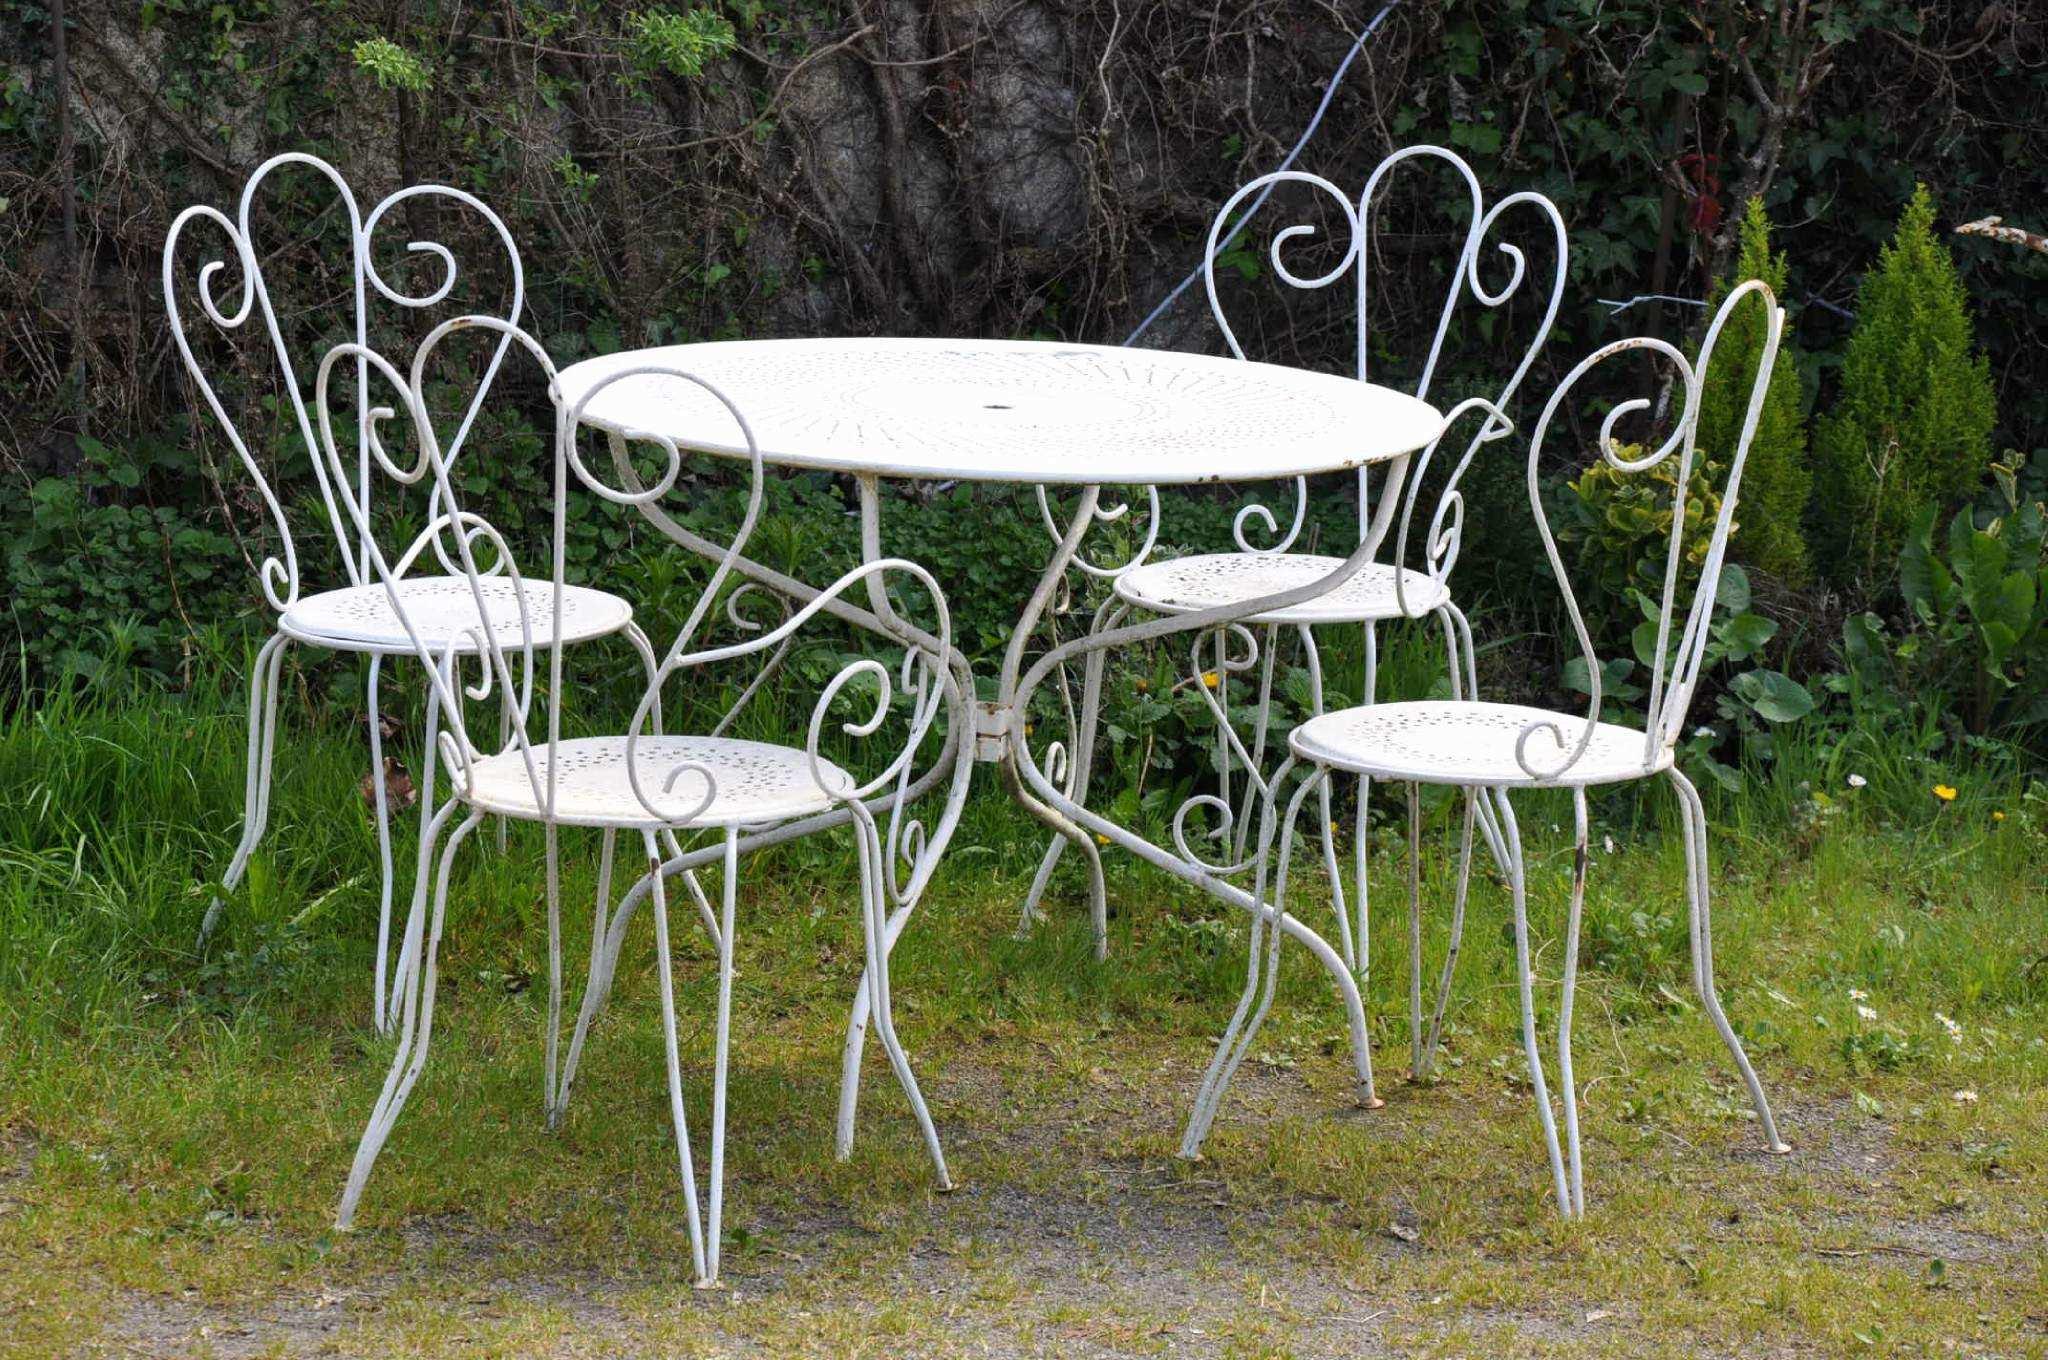 Coussin chaise jardin leclerc - veranda-styledevie.fr